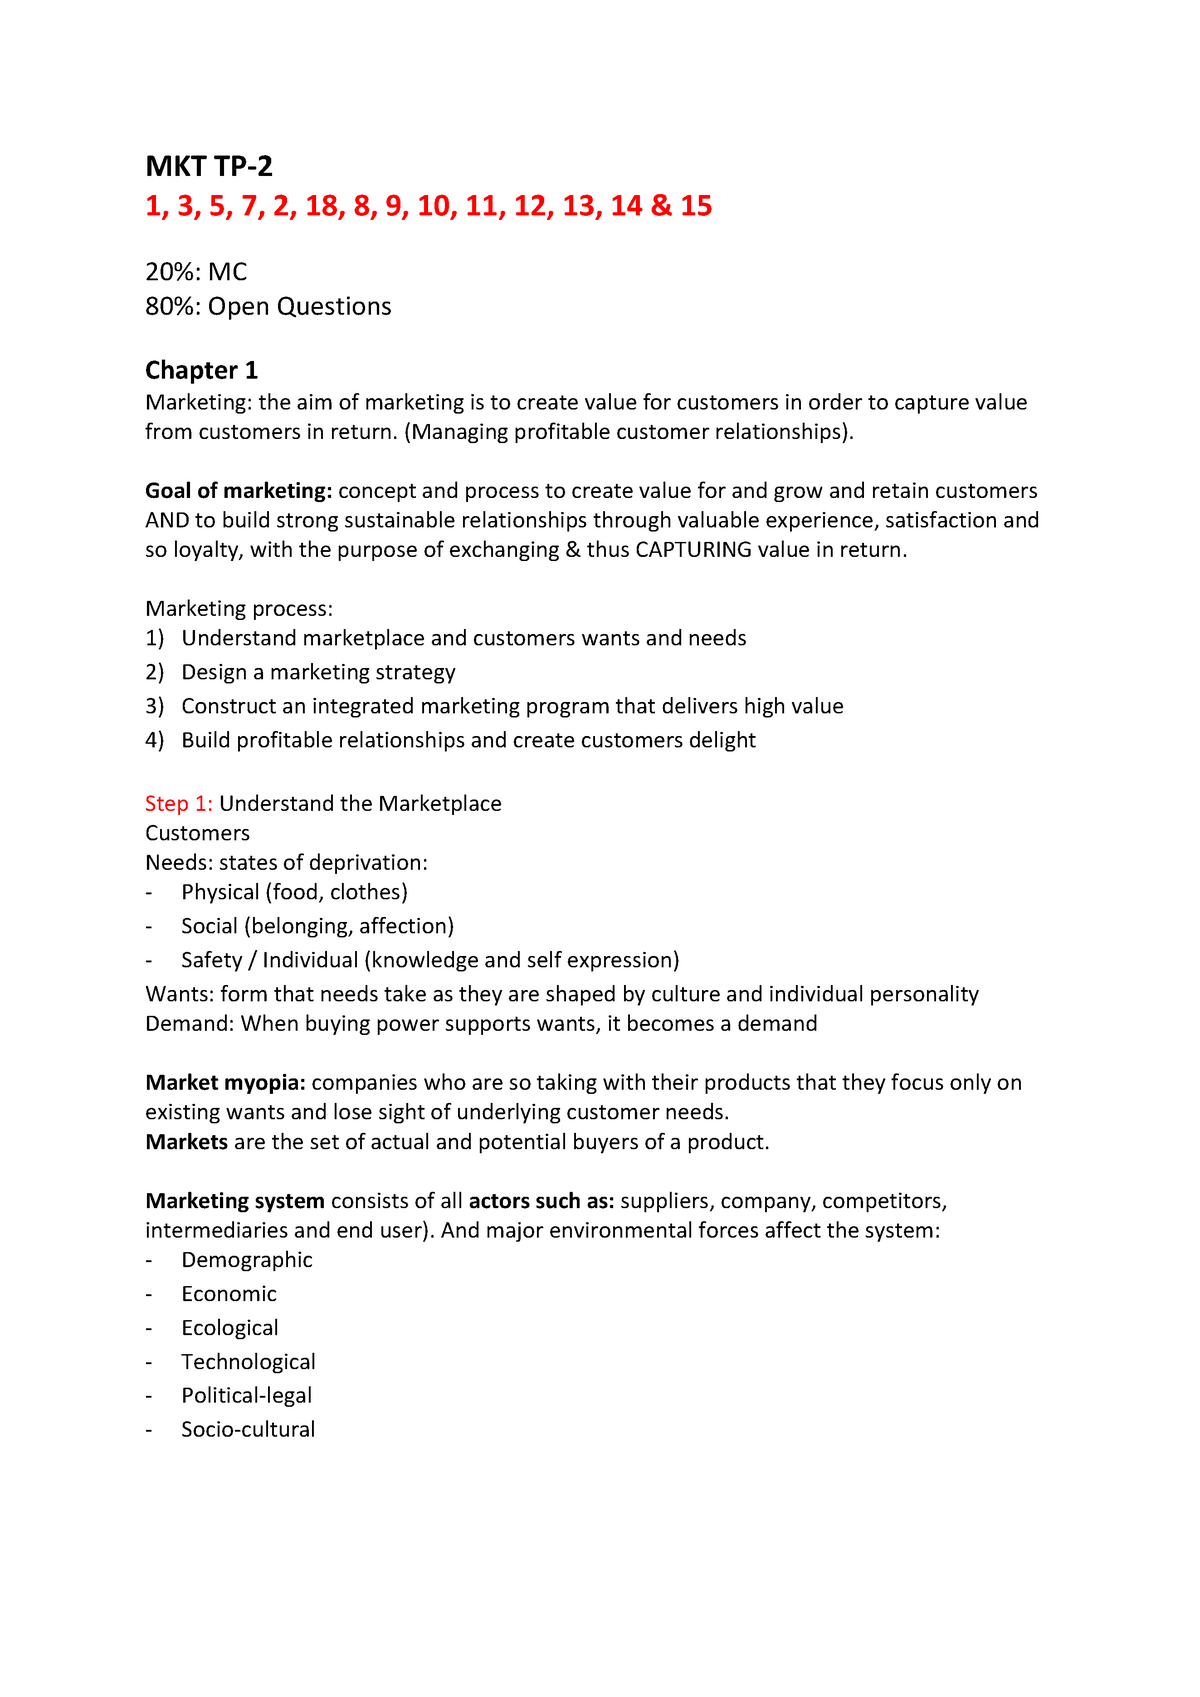 Summary, marketing, Test Period 1 - HHS-IBMS-018: Marketing